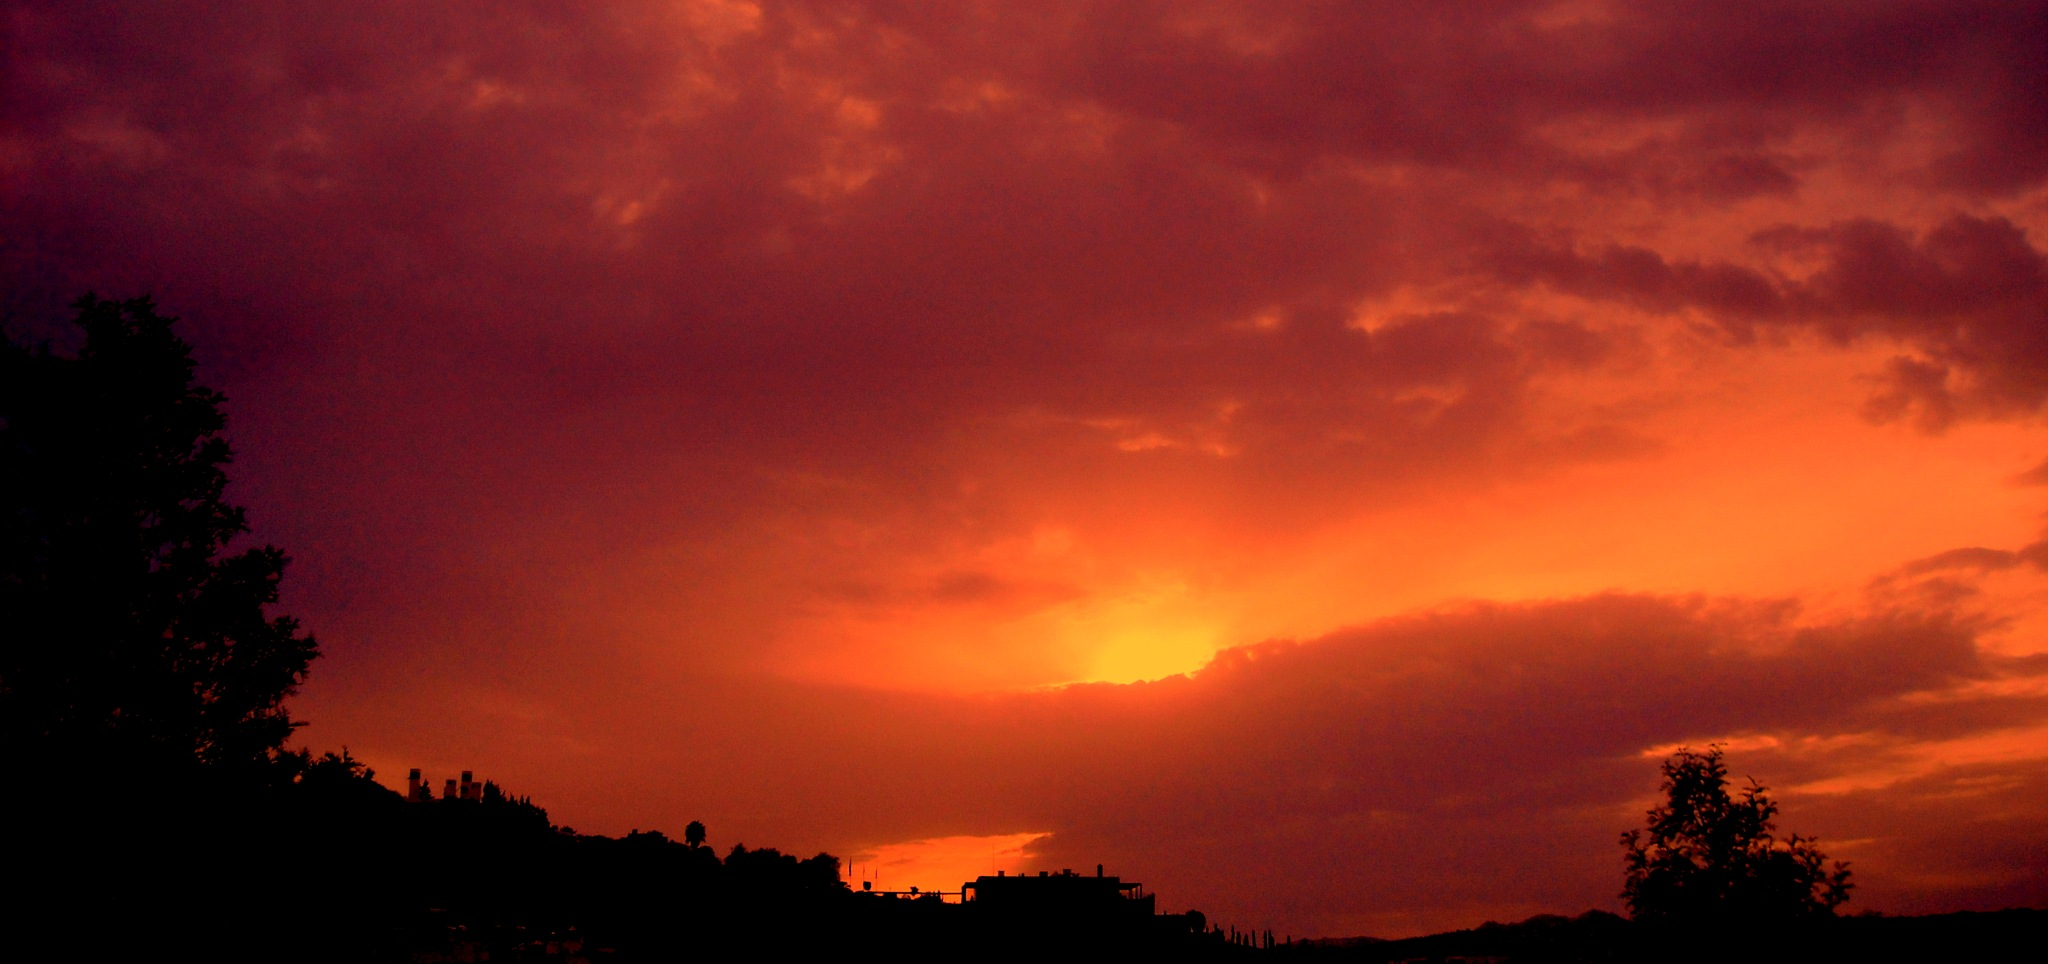 FORGOTTEN SUNSETS 137 by Akin Saner